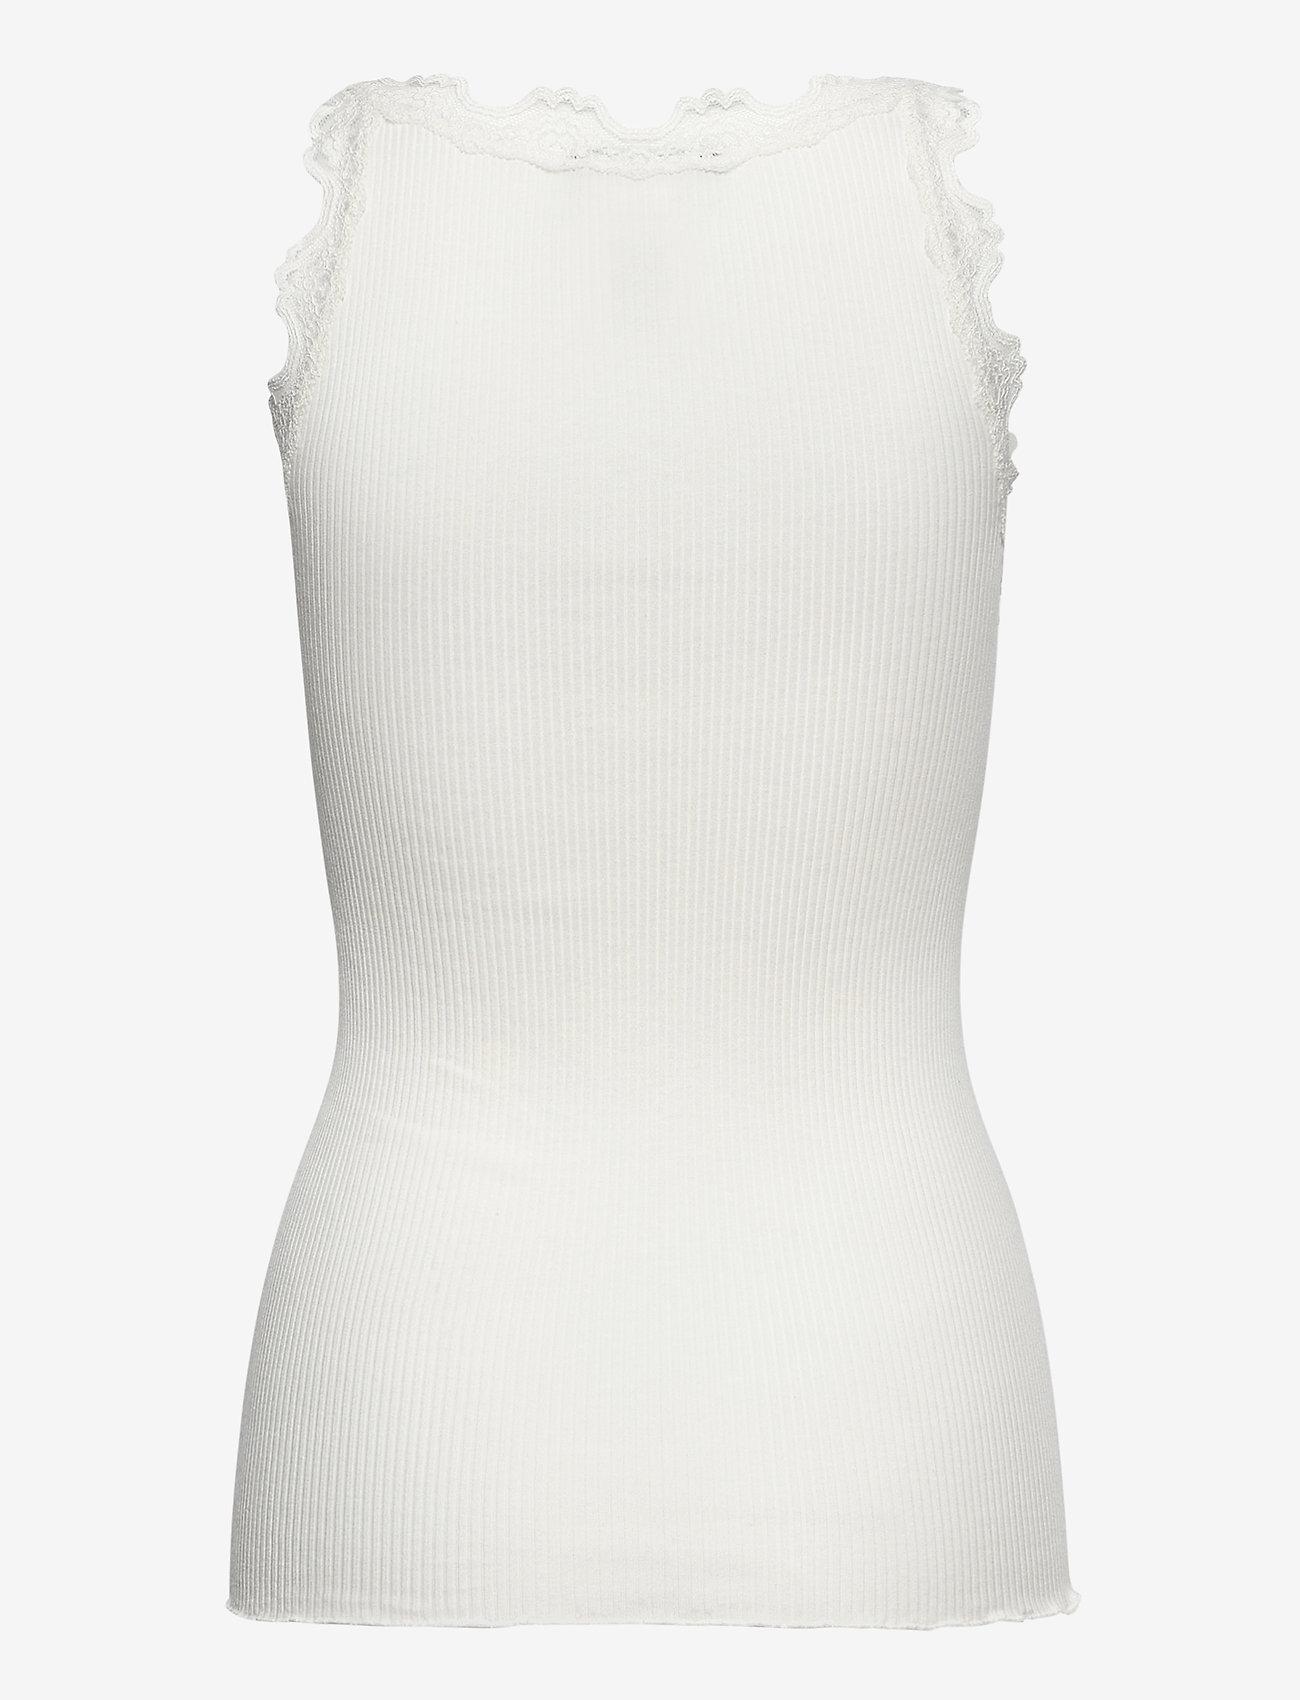 Rosemunde - Silk top regular w/vintage lace - linnen - ivory - 1